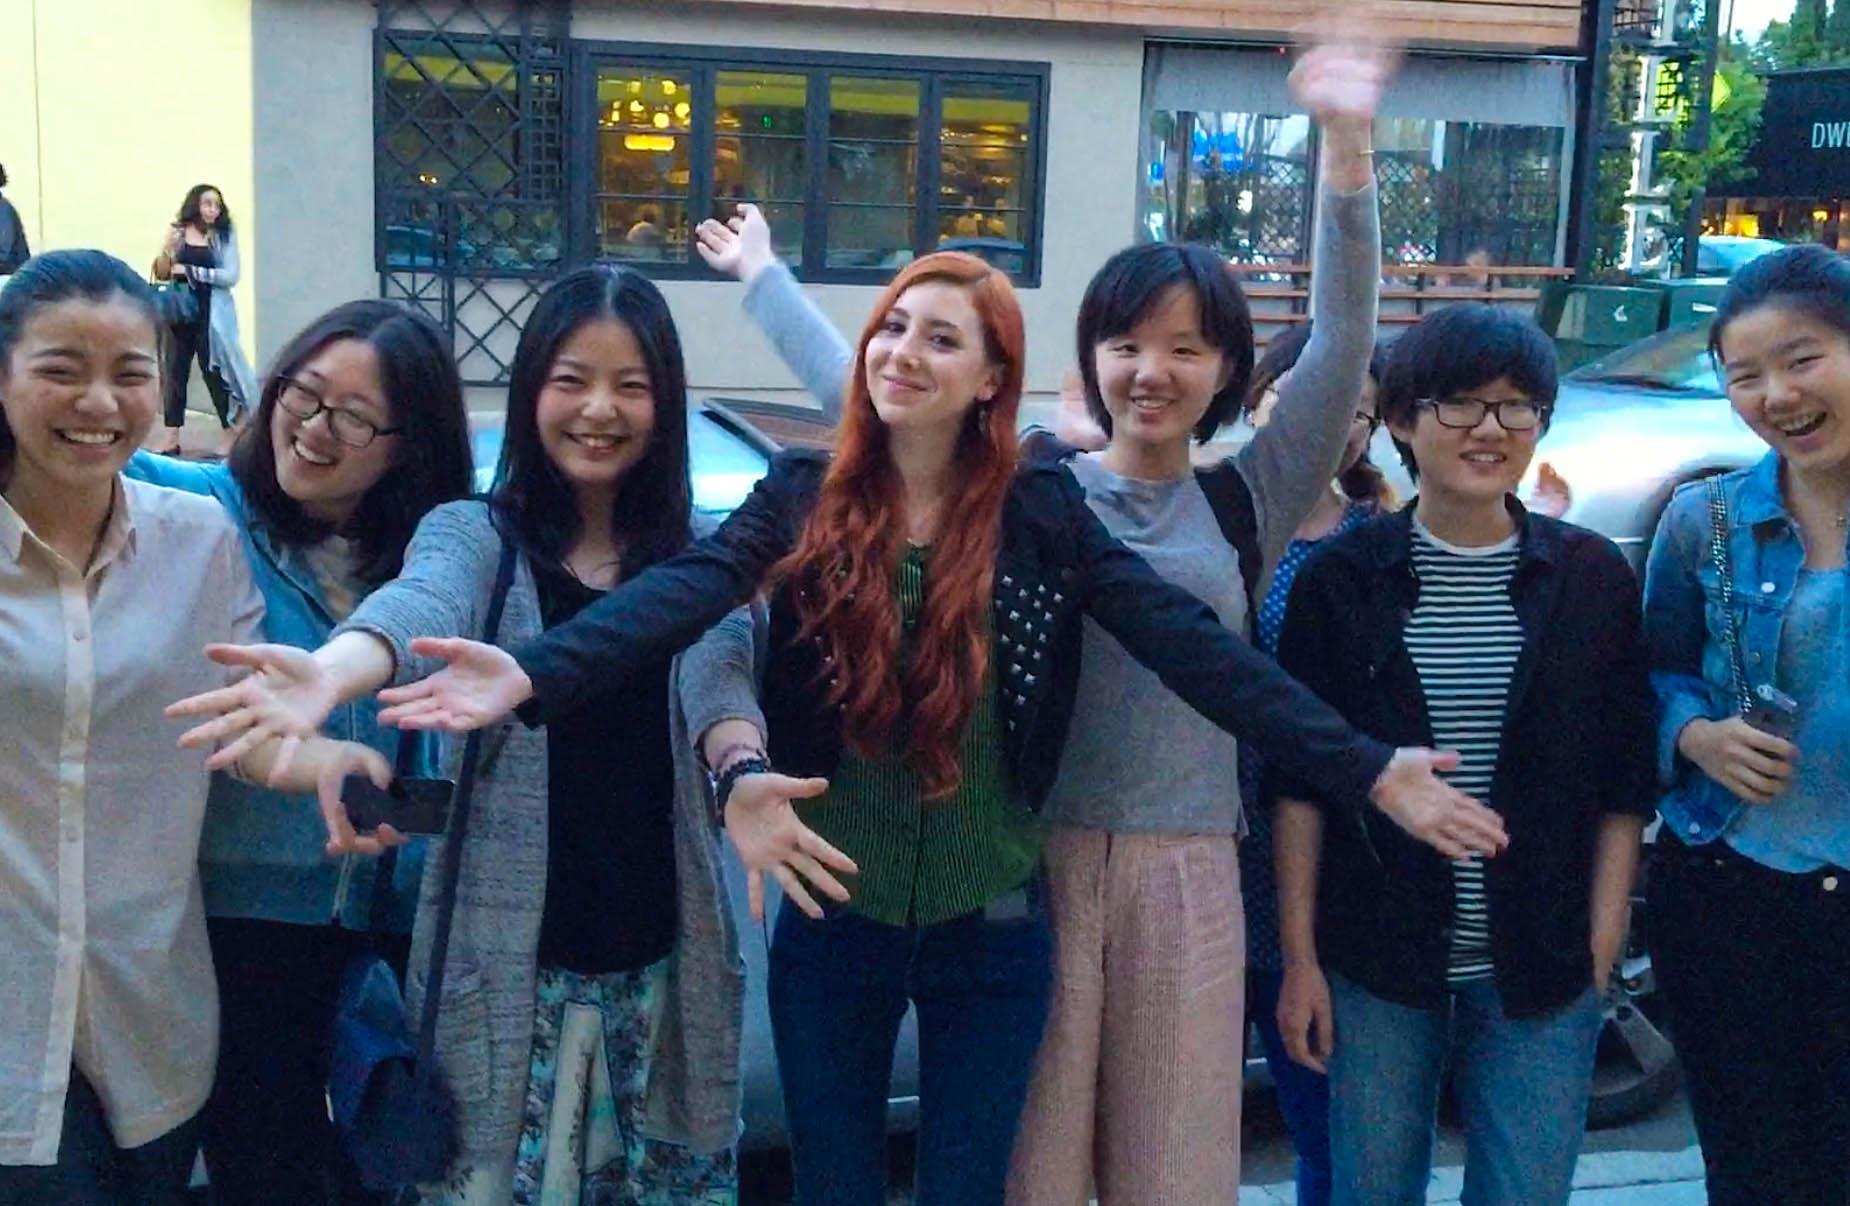 LR FH Chinese lemonade girls 1.jpg